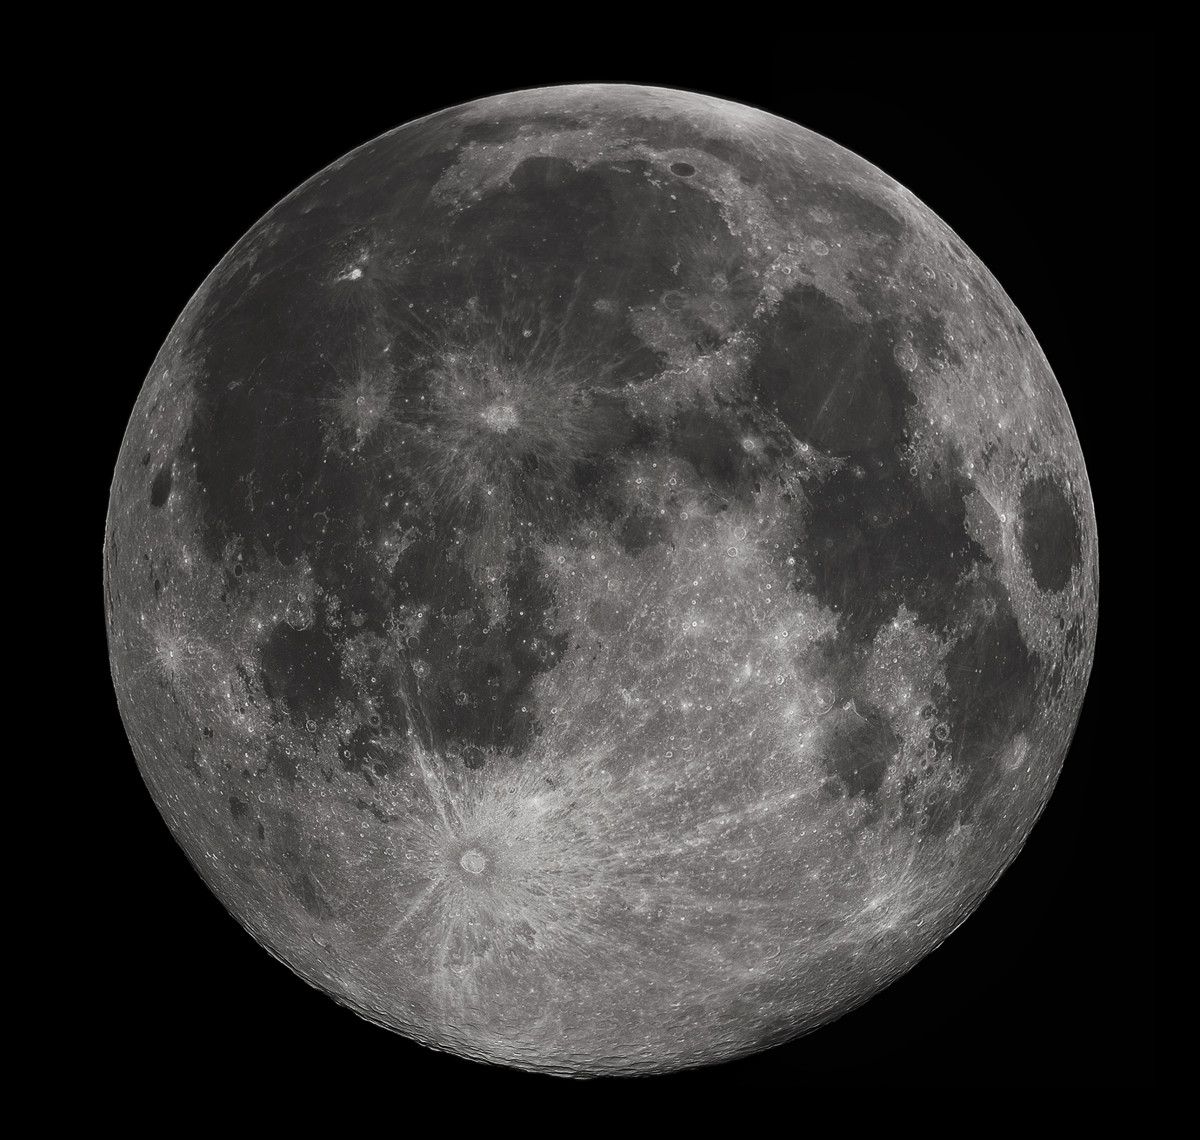 A Full Moon Up Close